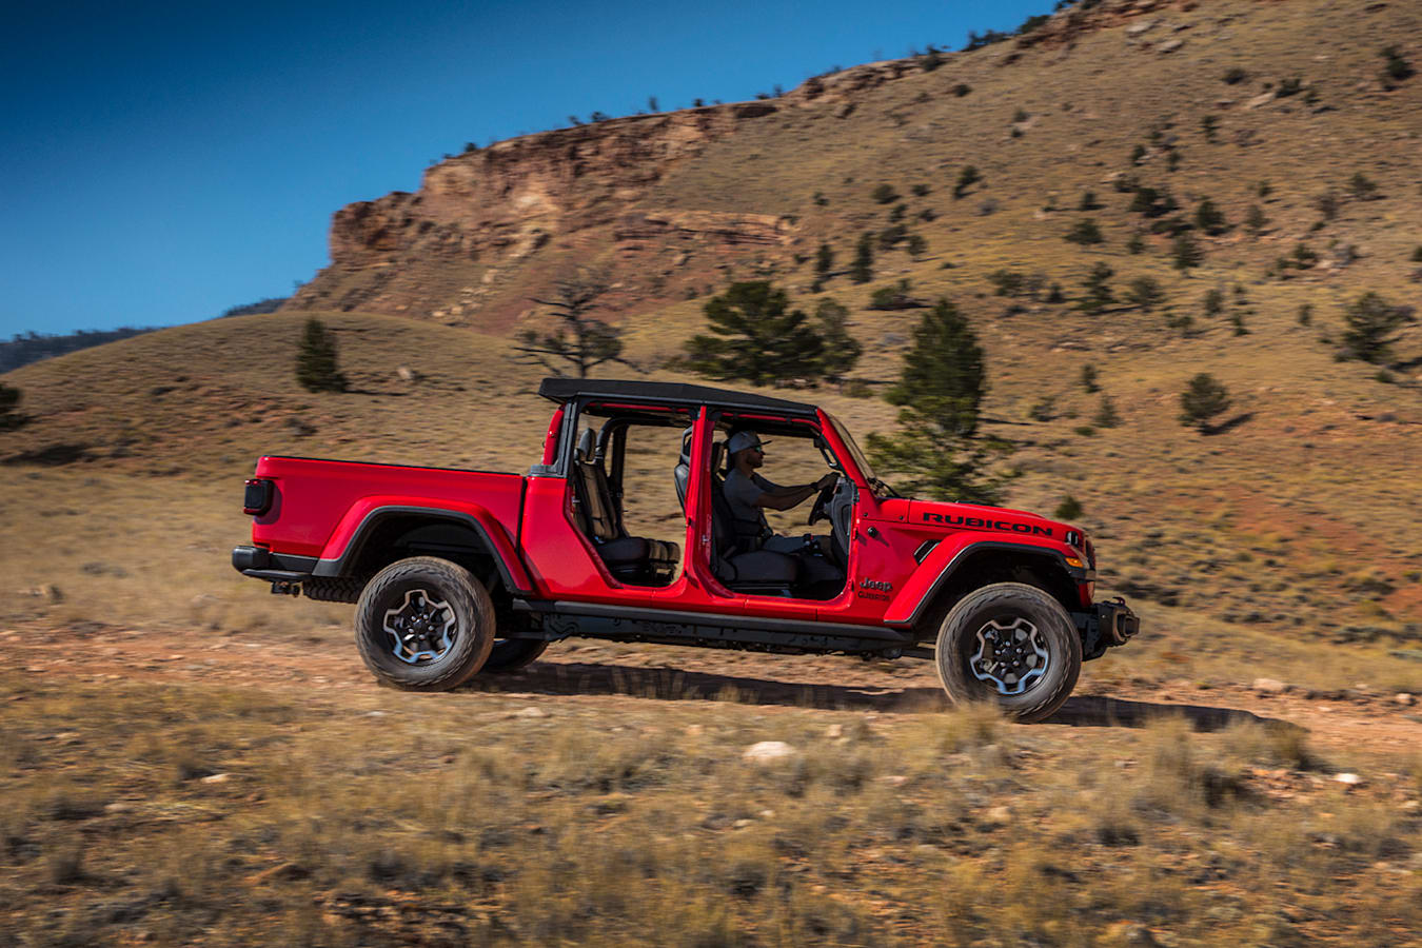 Jeep Gladiator Jpg